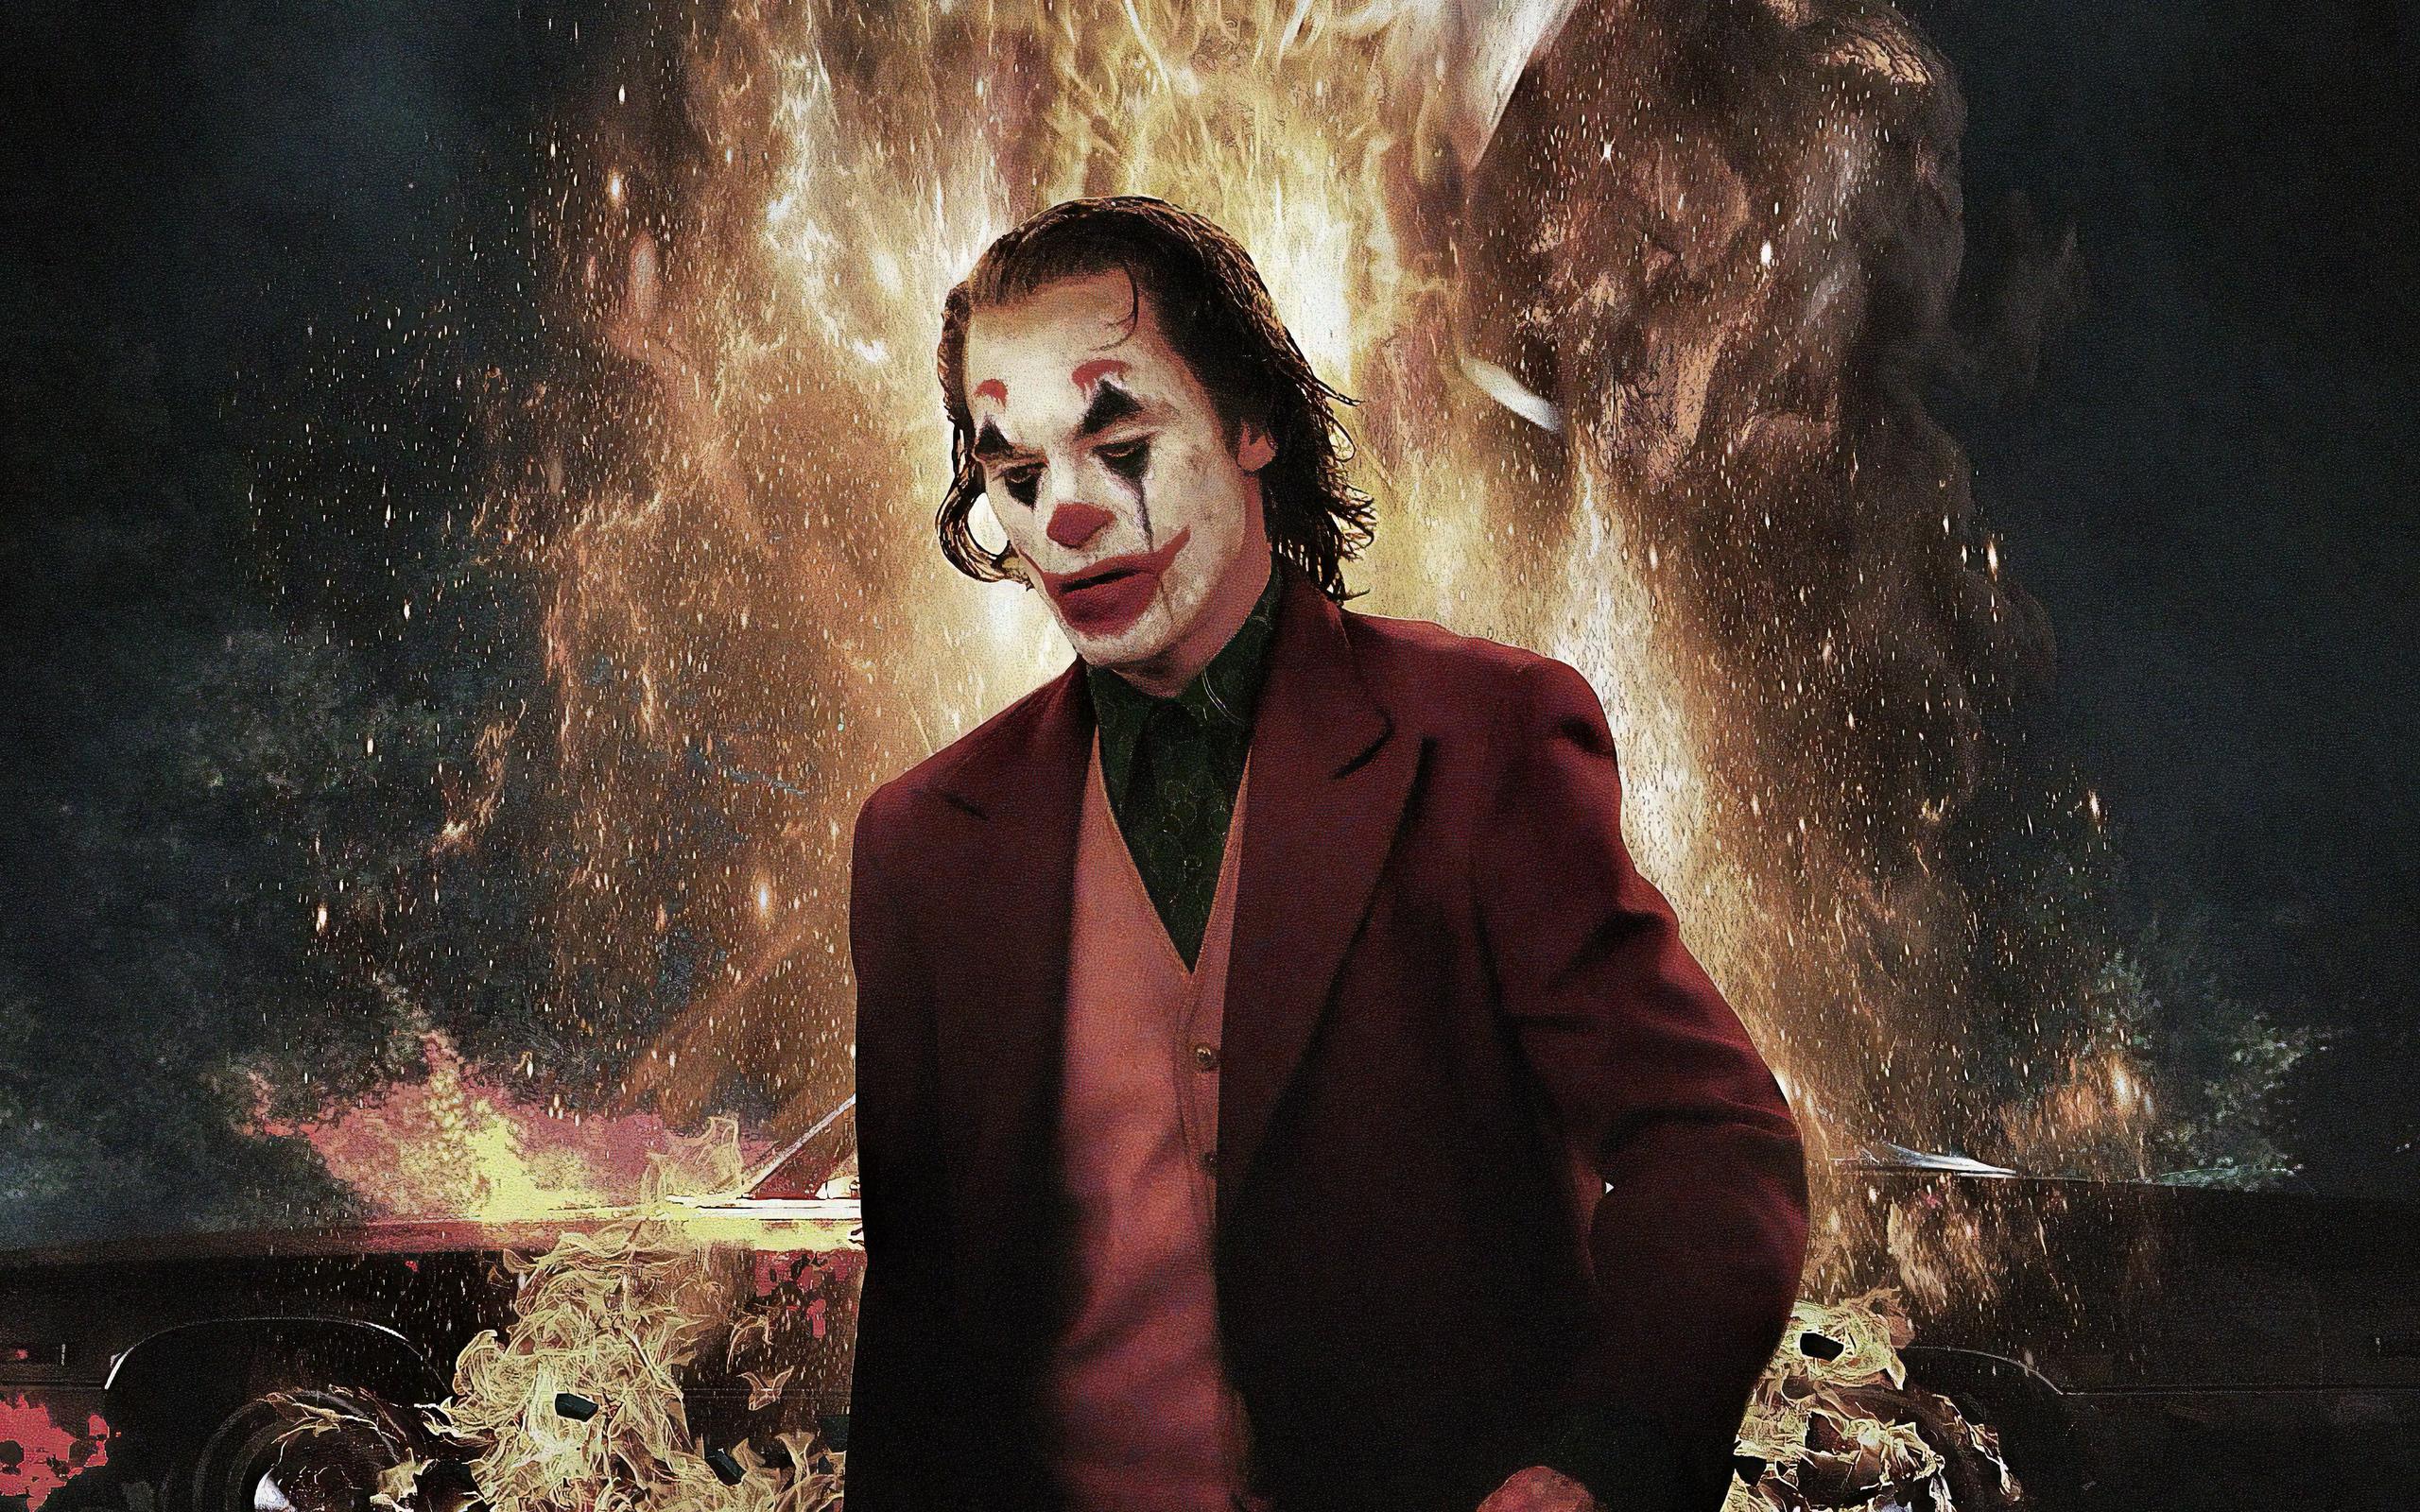 2560x1600 Joker 2019 Movie 4k New 2560x1600 Resolution Hd 4k